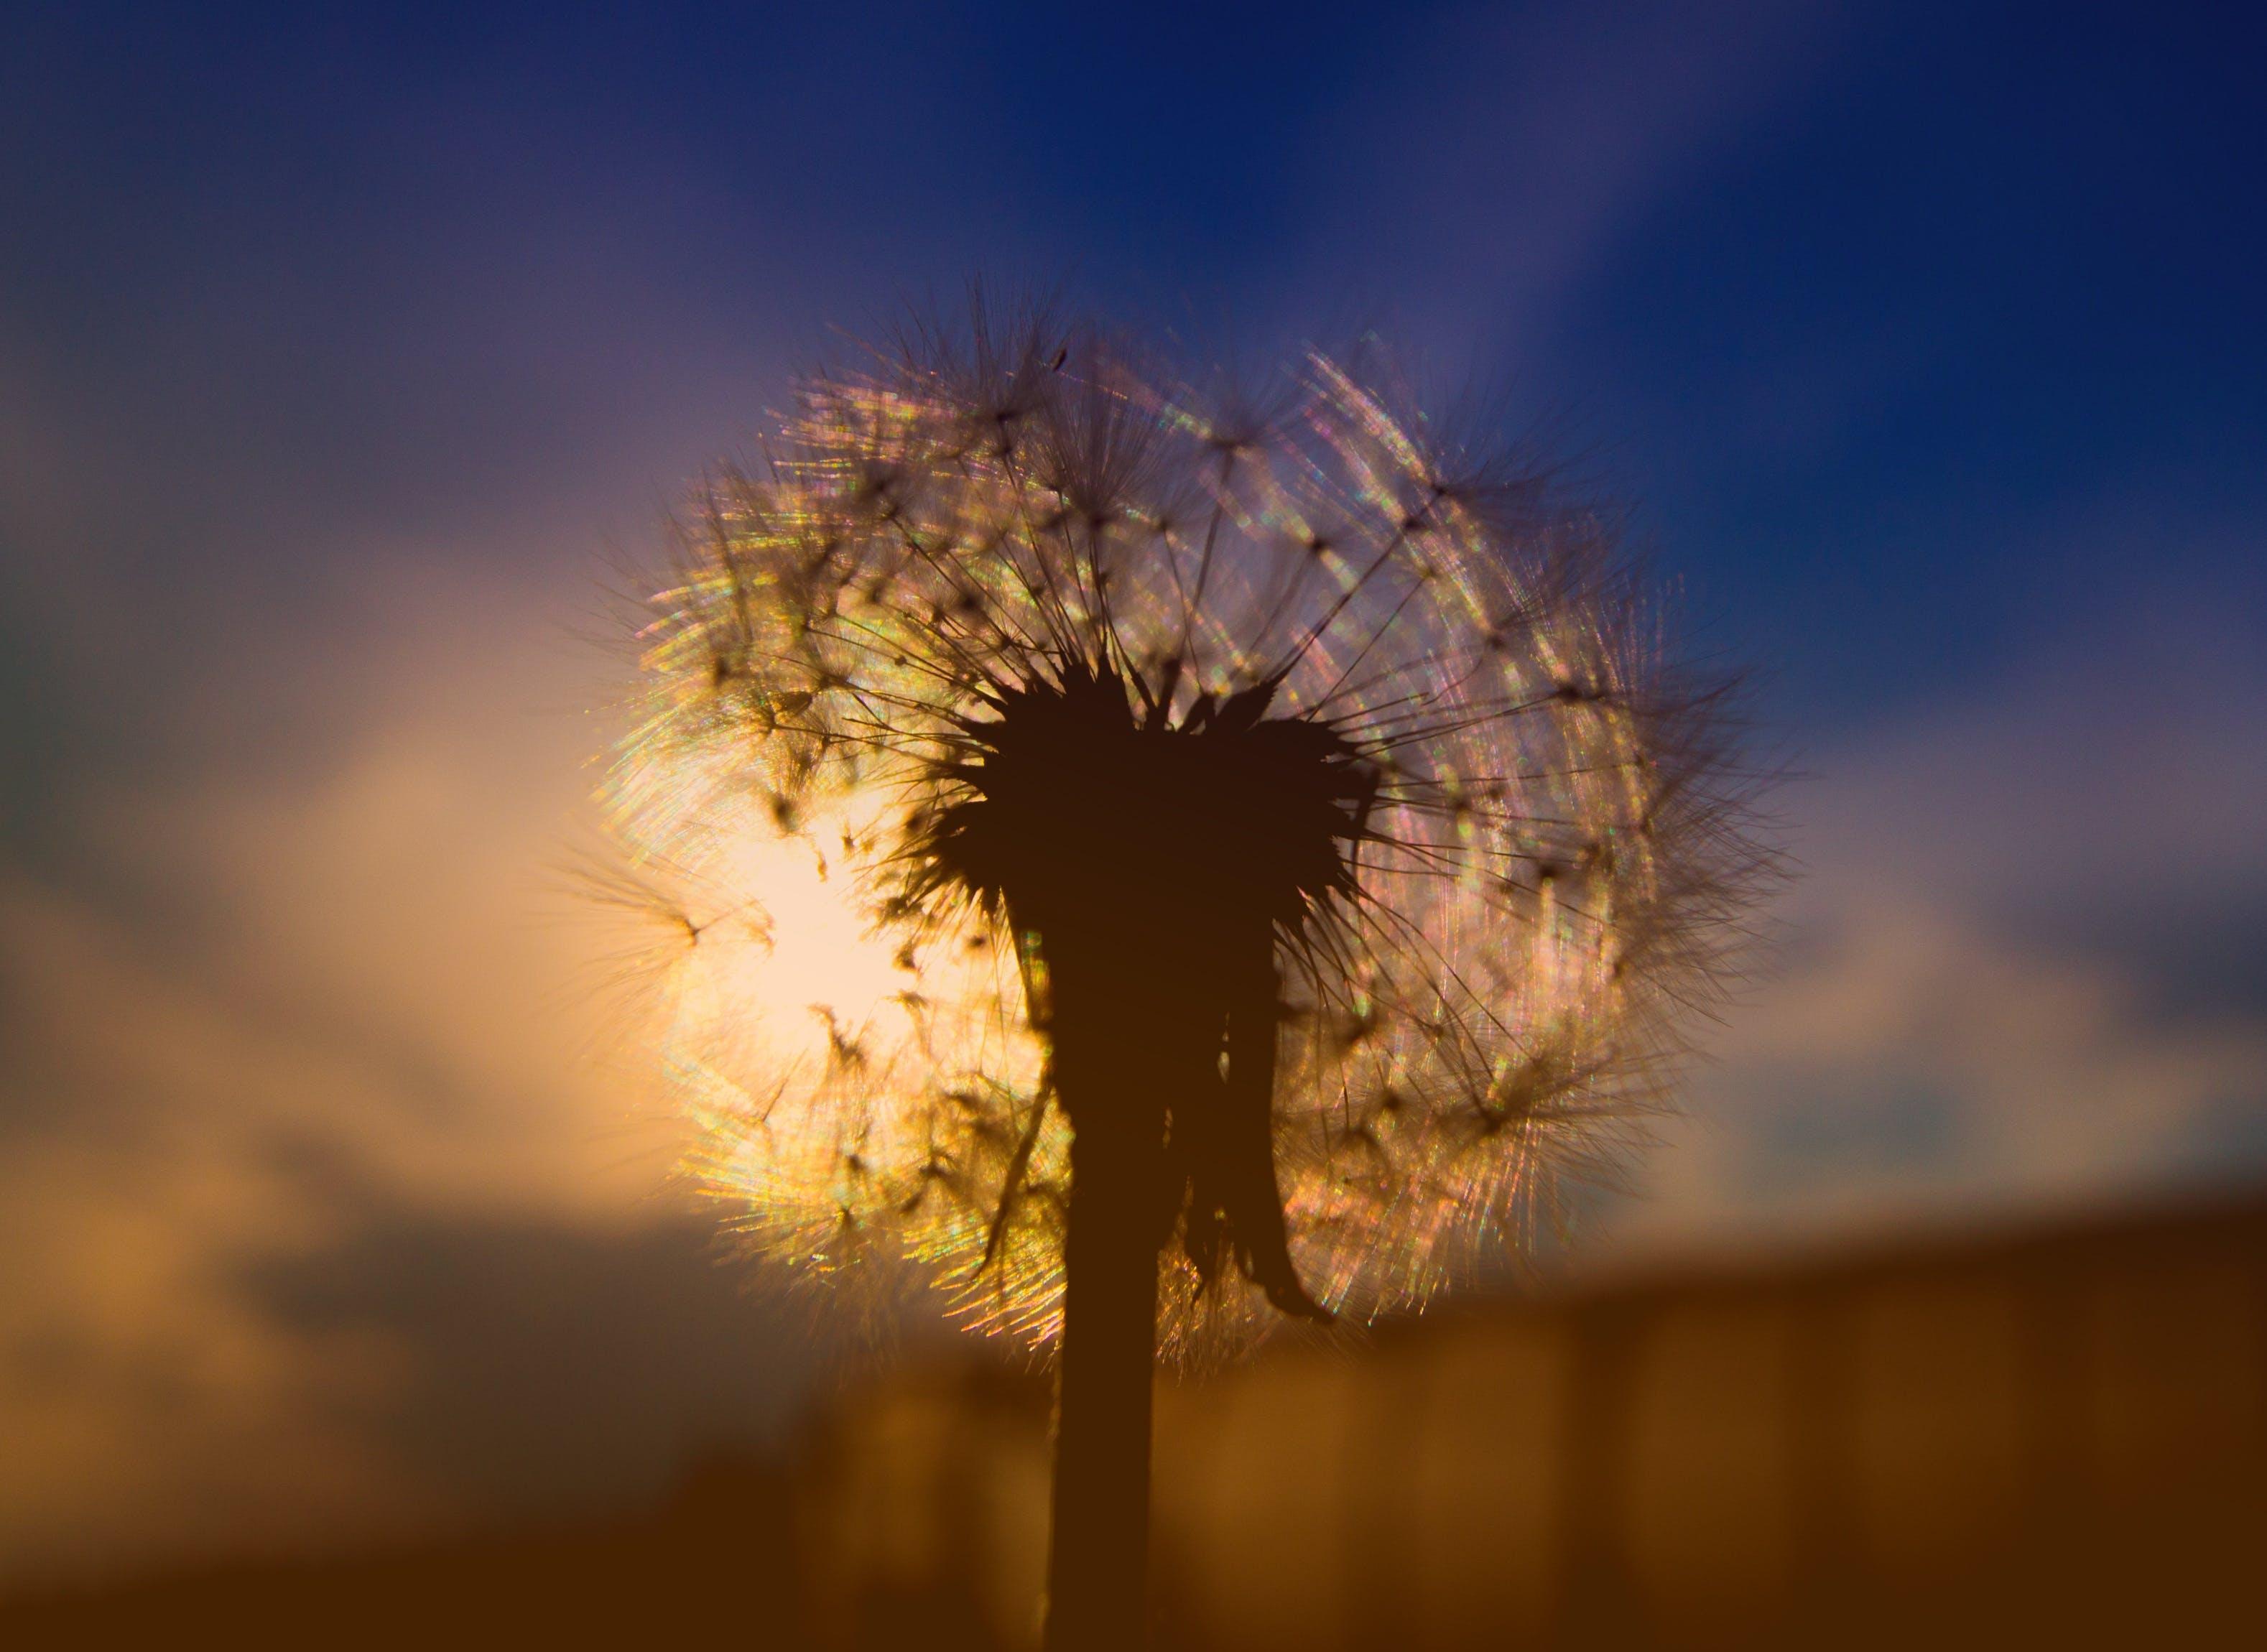 Selective Focus Photography of Dandelion